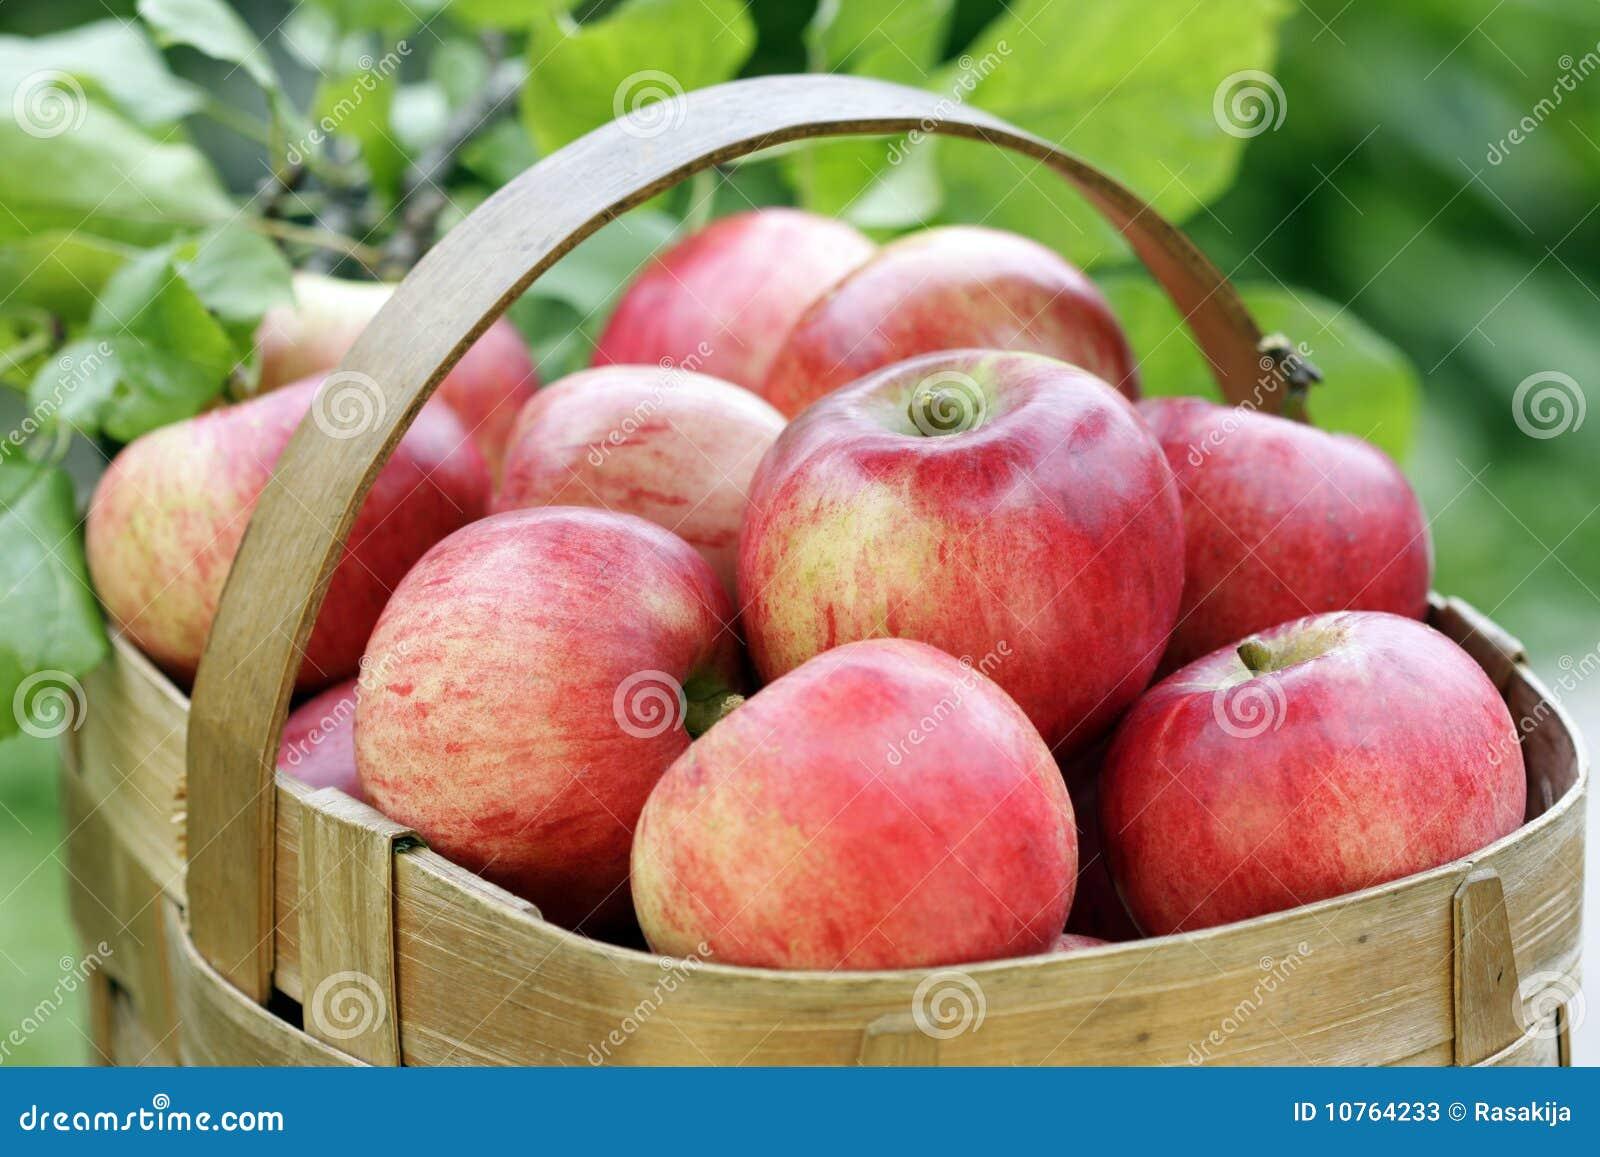 panier des pommes rouges photos stock image 10764233. Black Bedroom Furniture Sets. Home Design Ideas